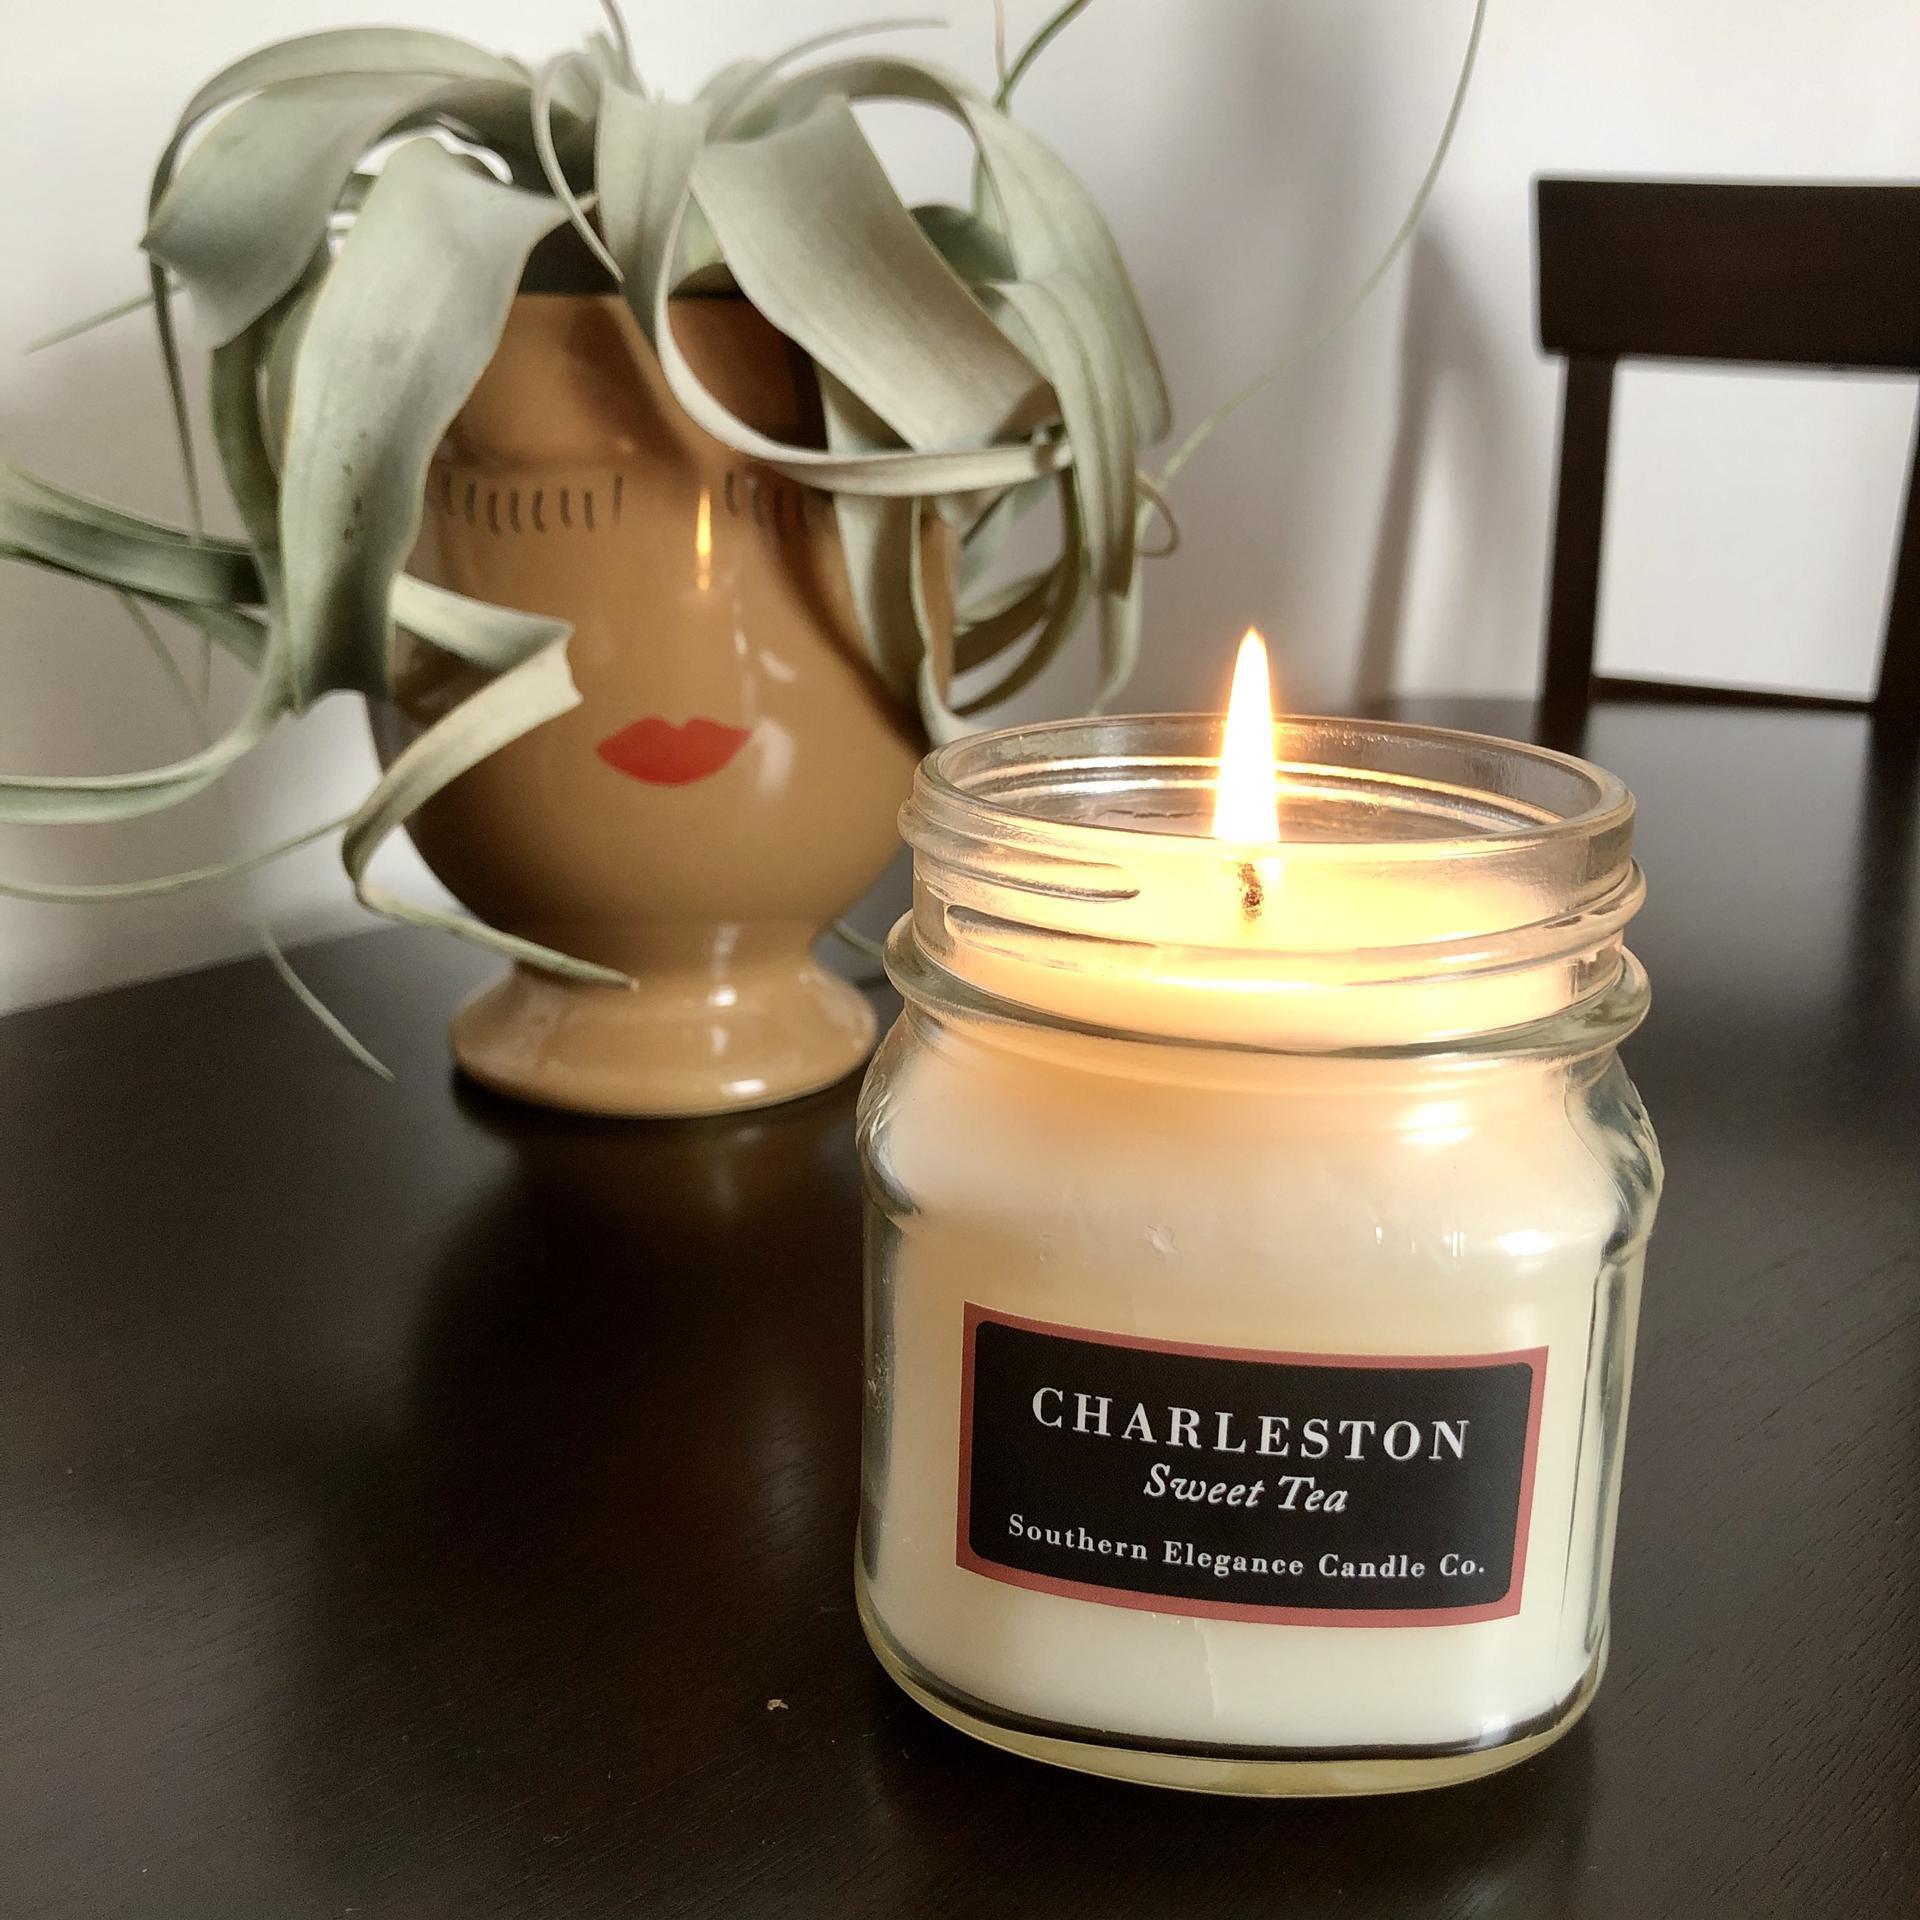 Charleston sweet tea candle in glass jar